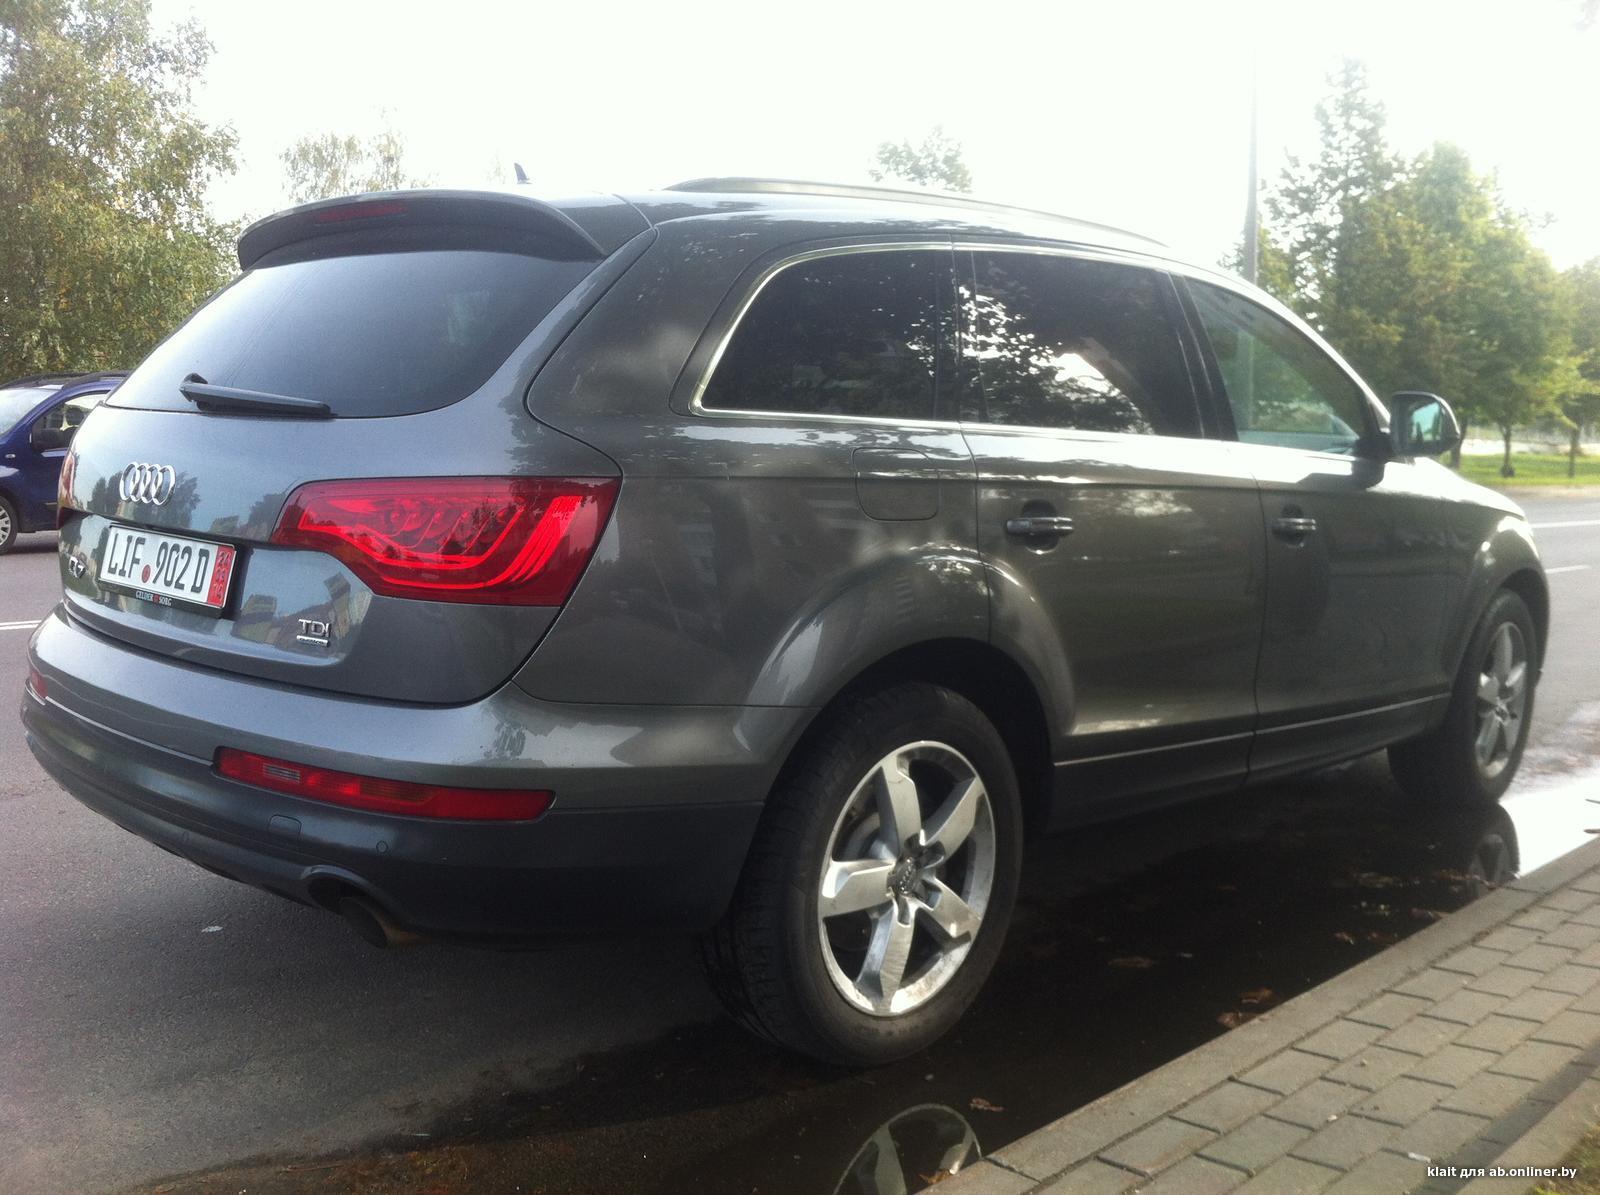 Audi Q7 Clean diesel